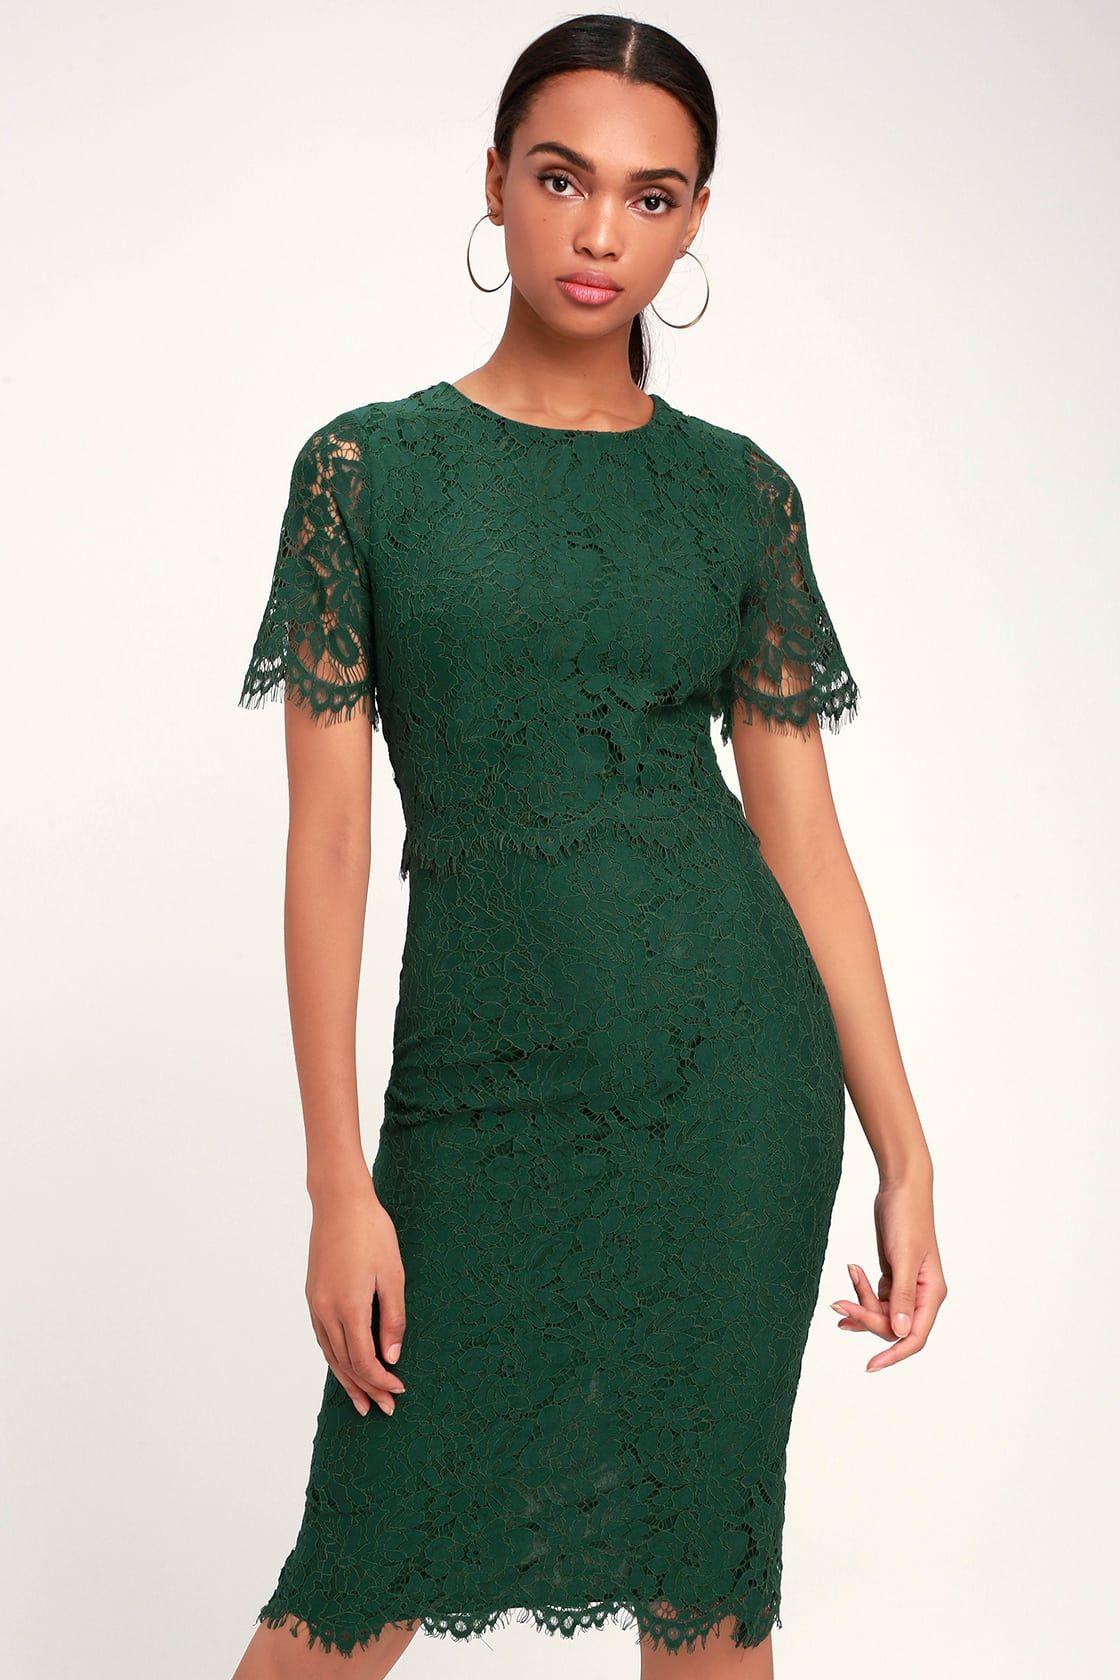 Devotion forest green lace short sleeve midi dress in 2020